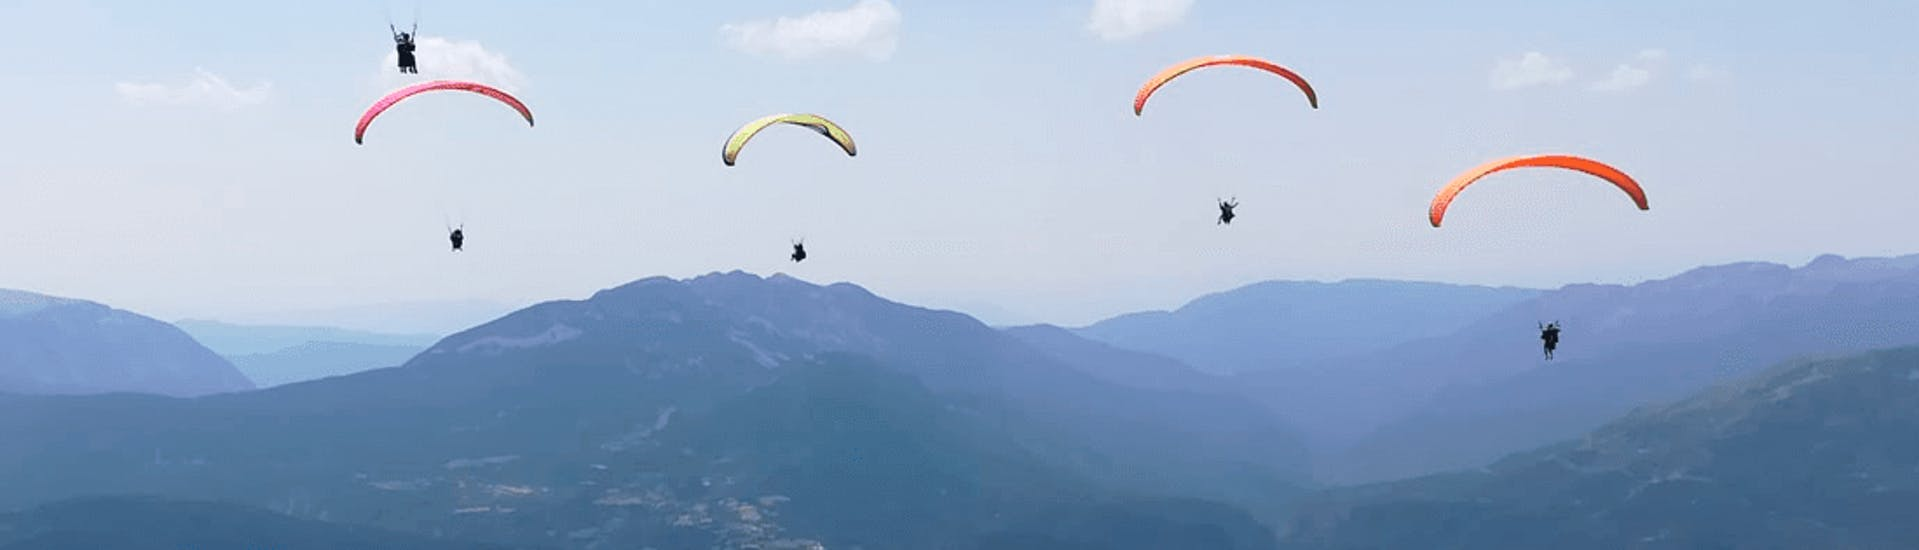 tandem-paragliding-highaltitude-parapente-pirineos-hero